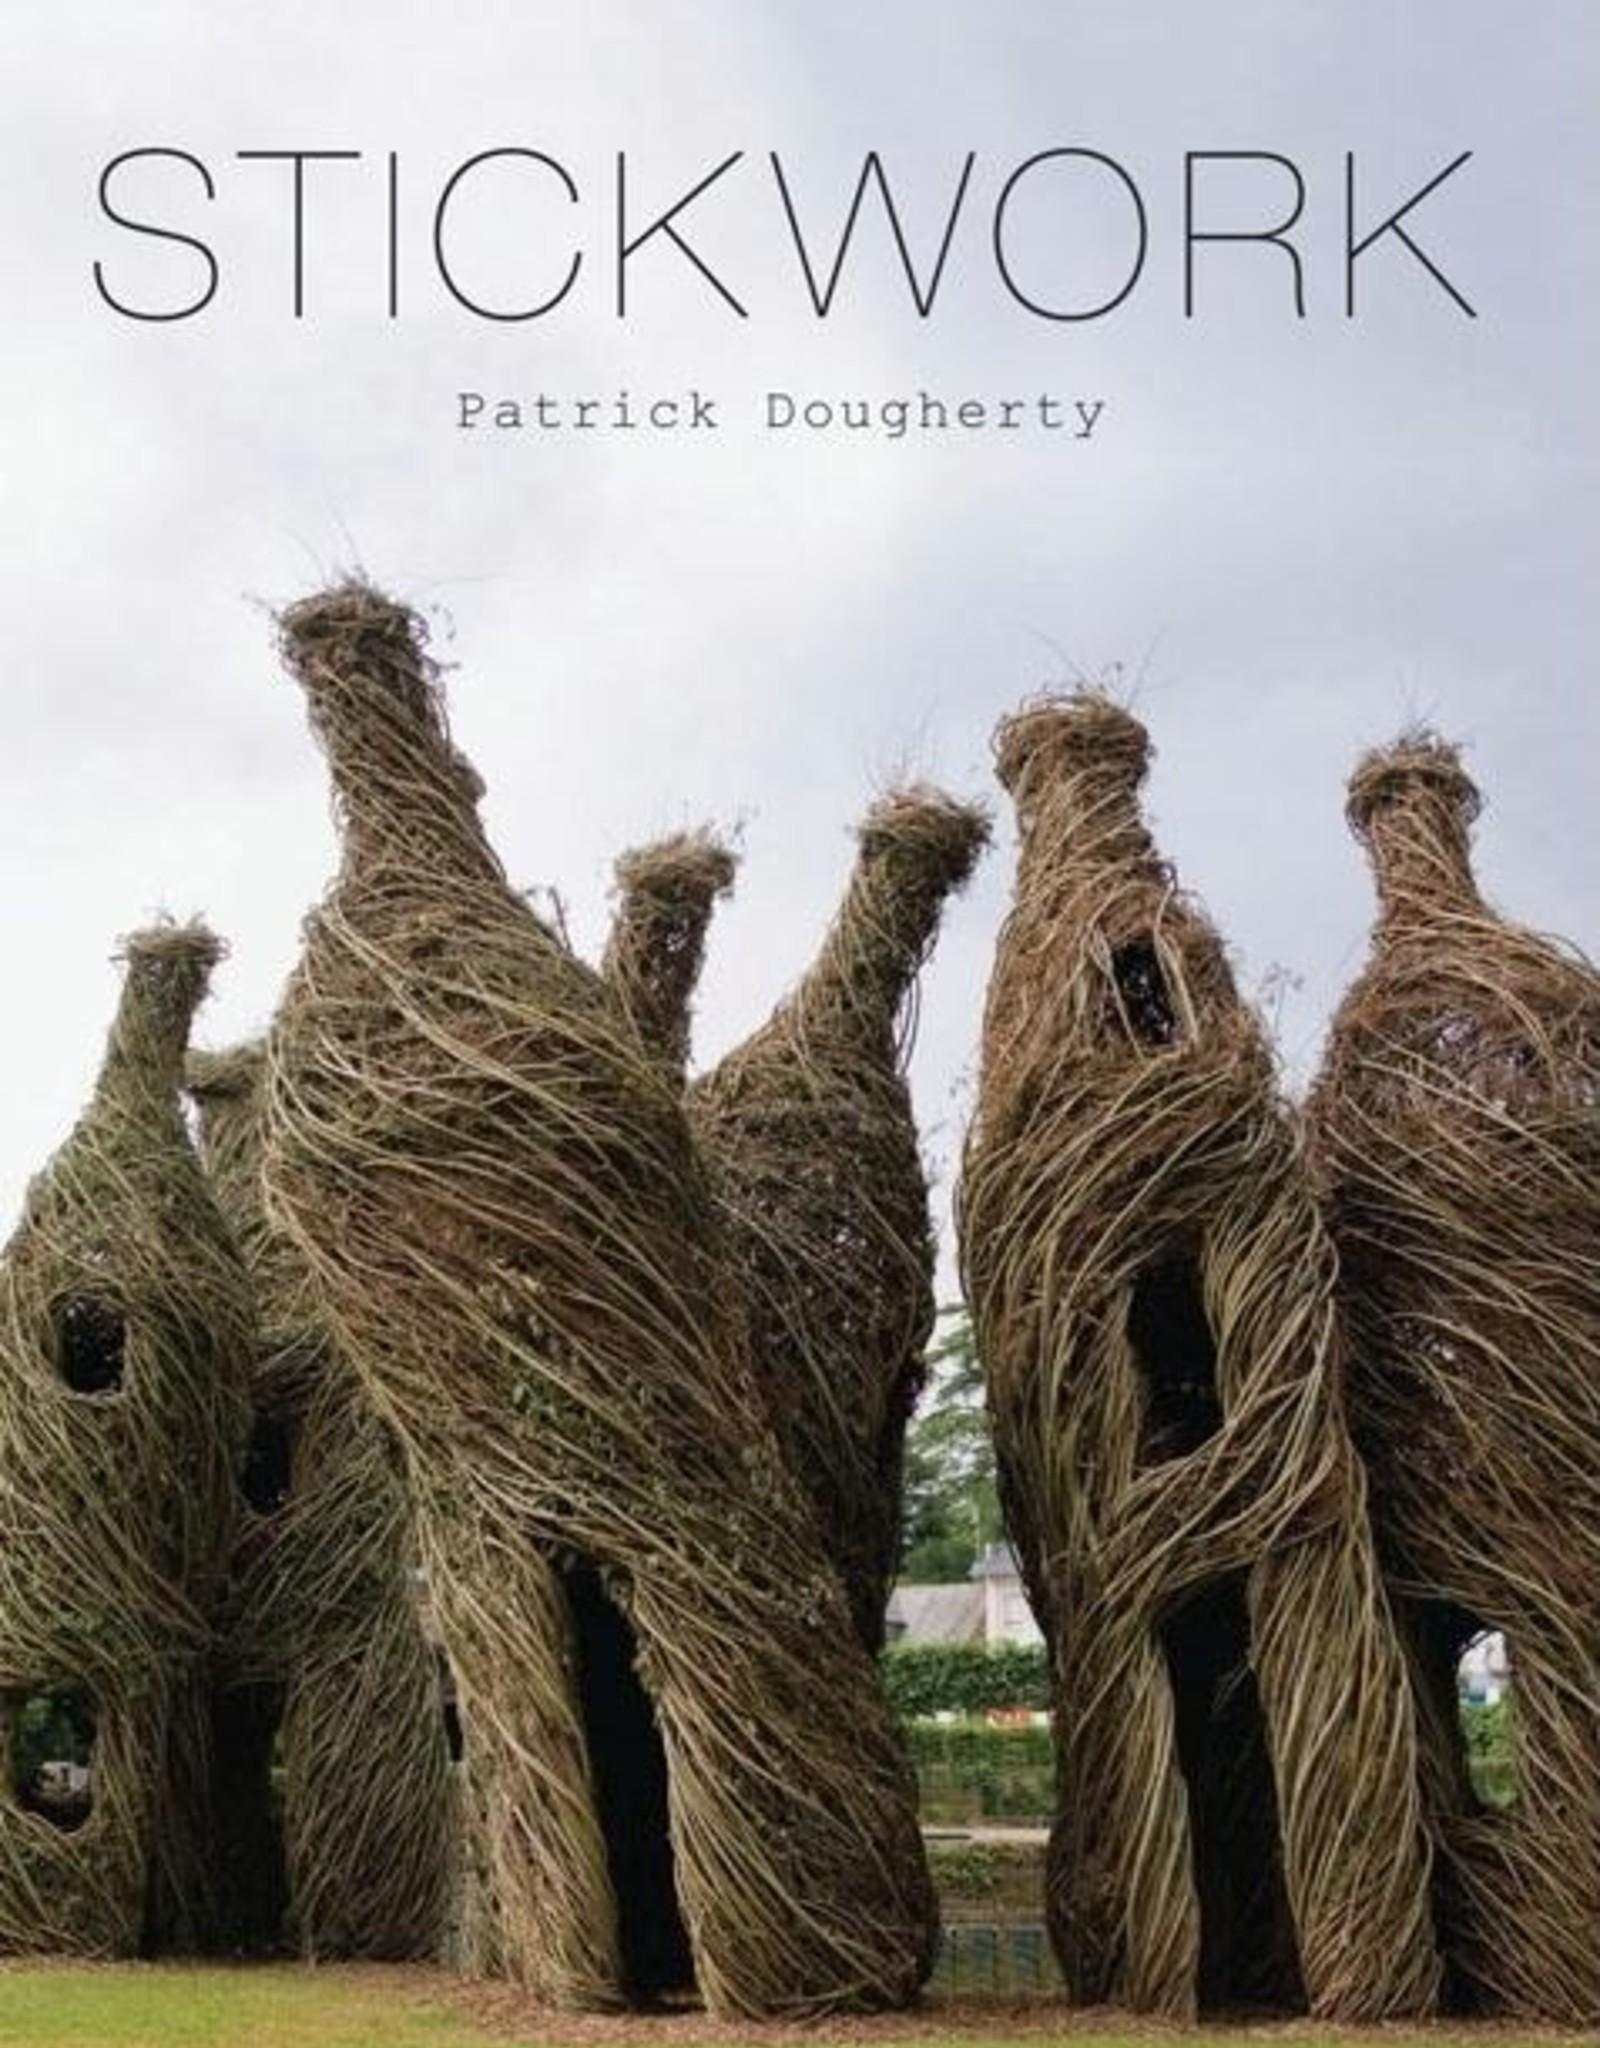 Stickwork / Patrick Dougherty